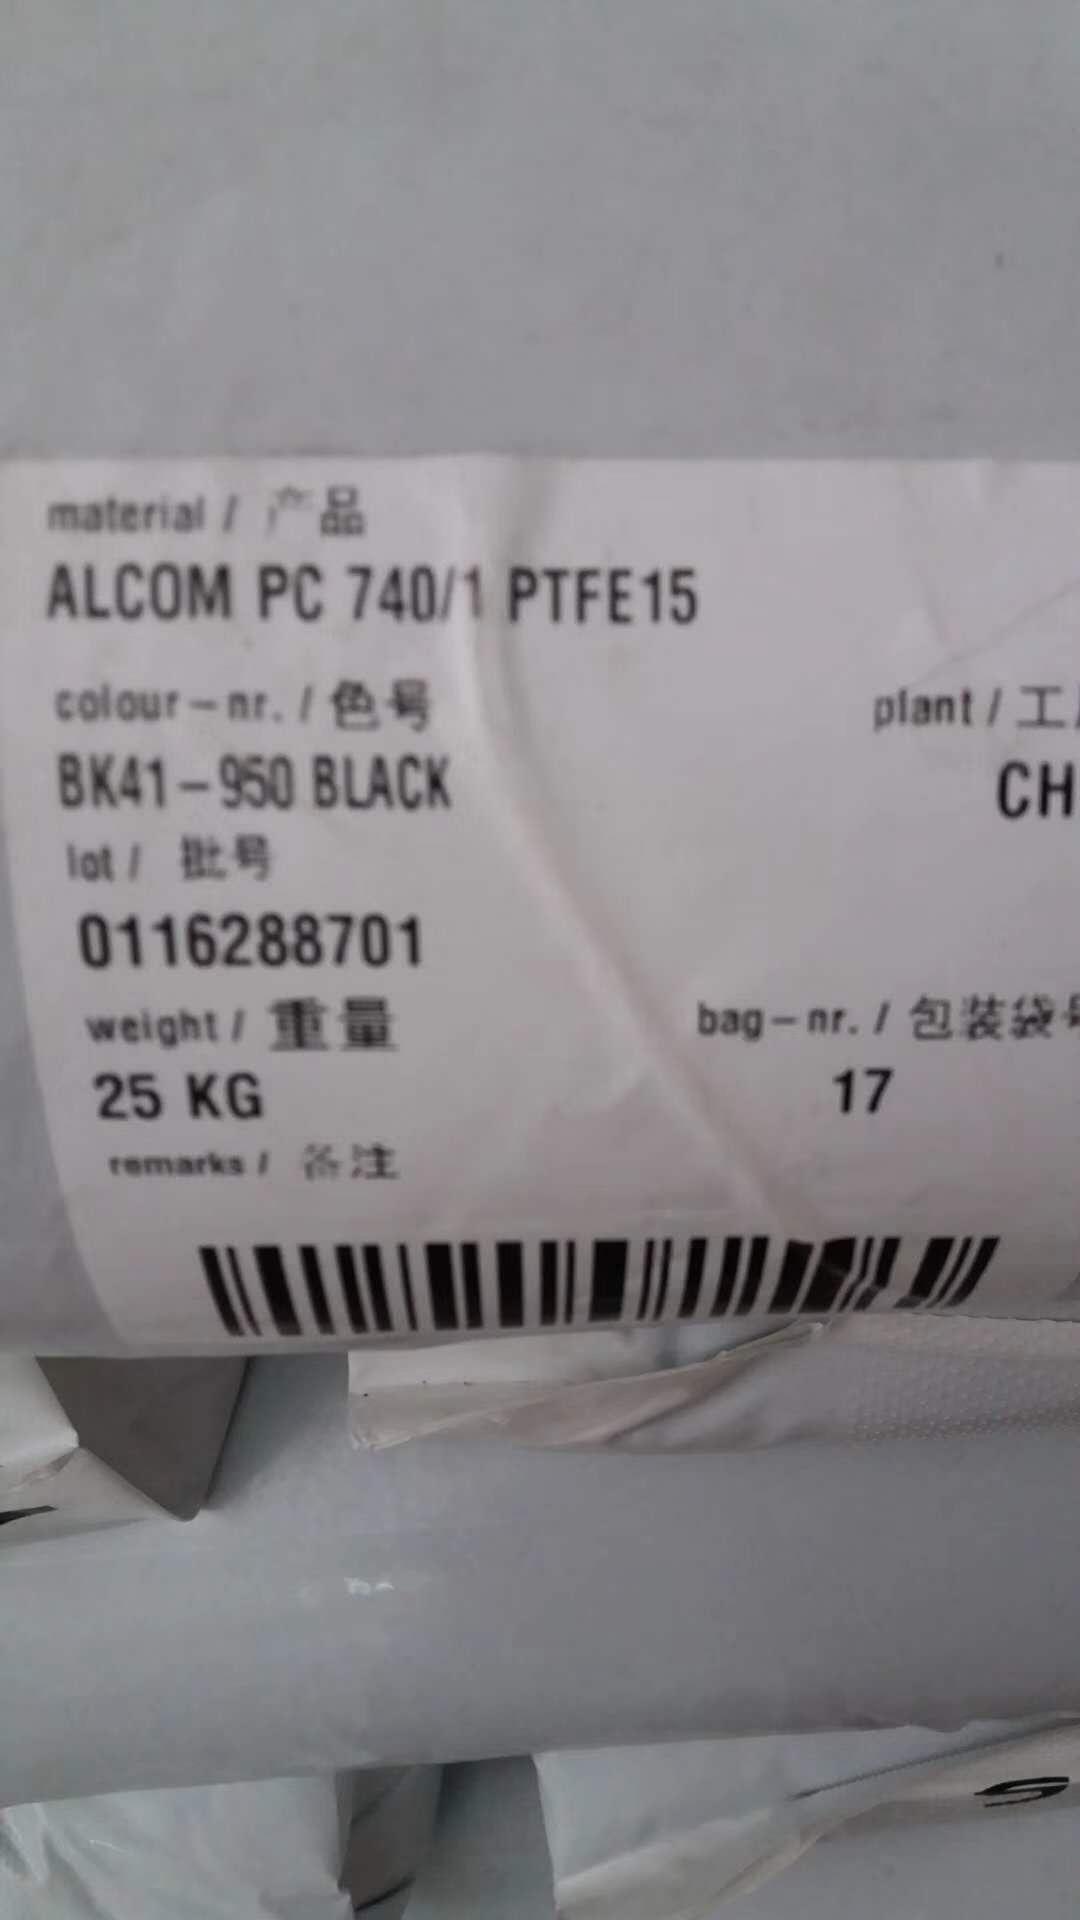 ALcom PC 740-1 PTFE15 BK41-950 BLACK